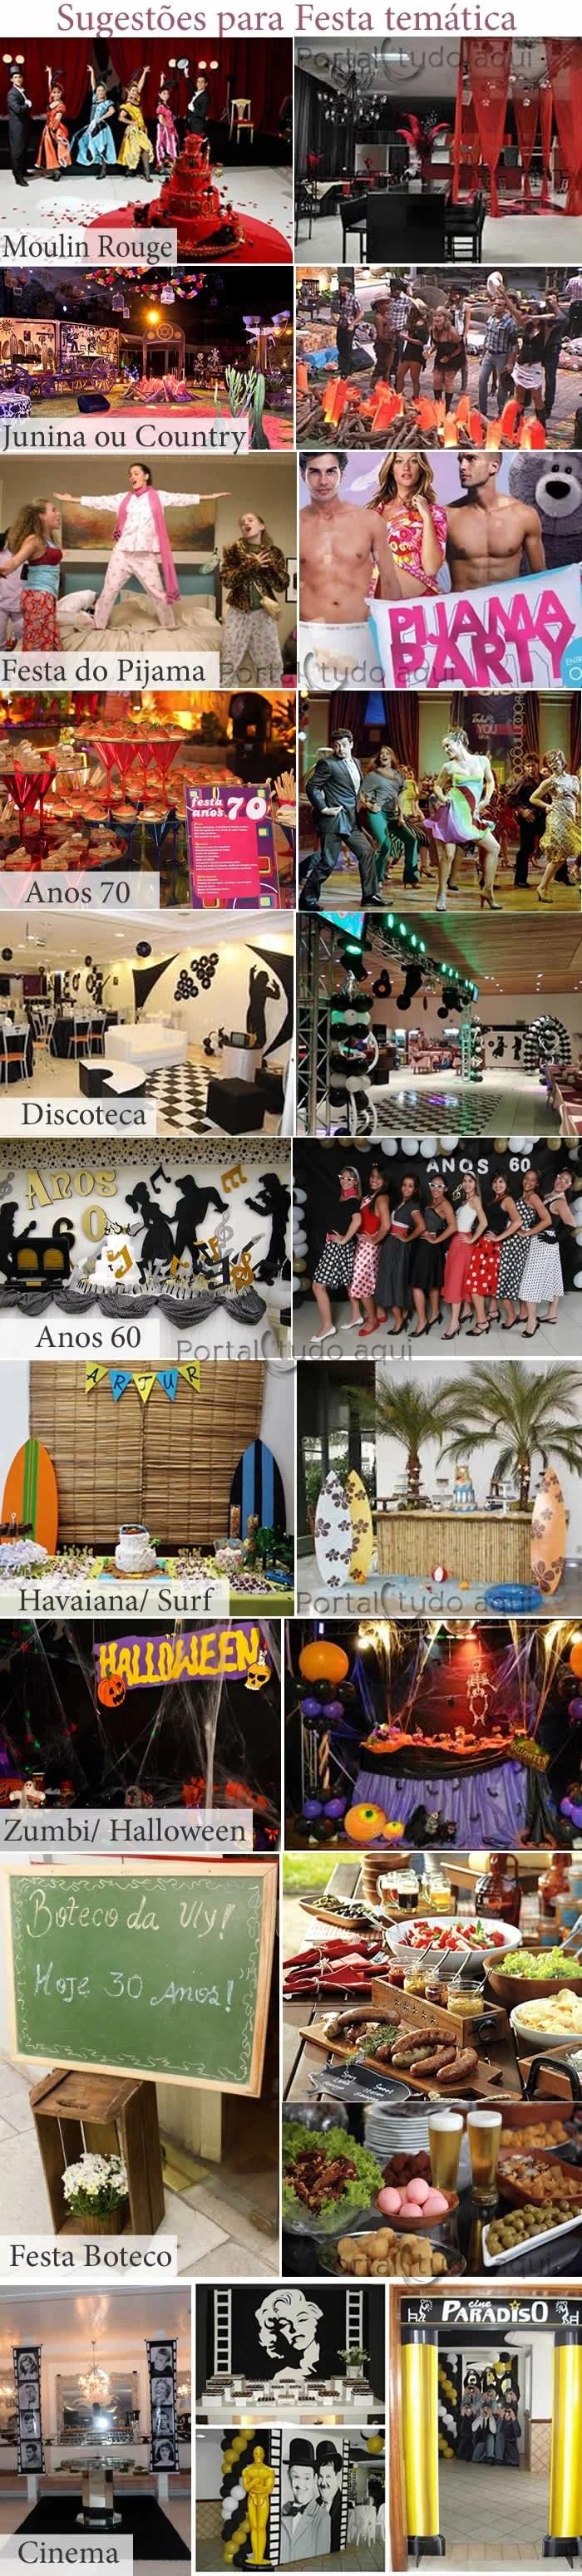 festa-tematica-sugestoes-aniversario